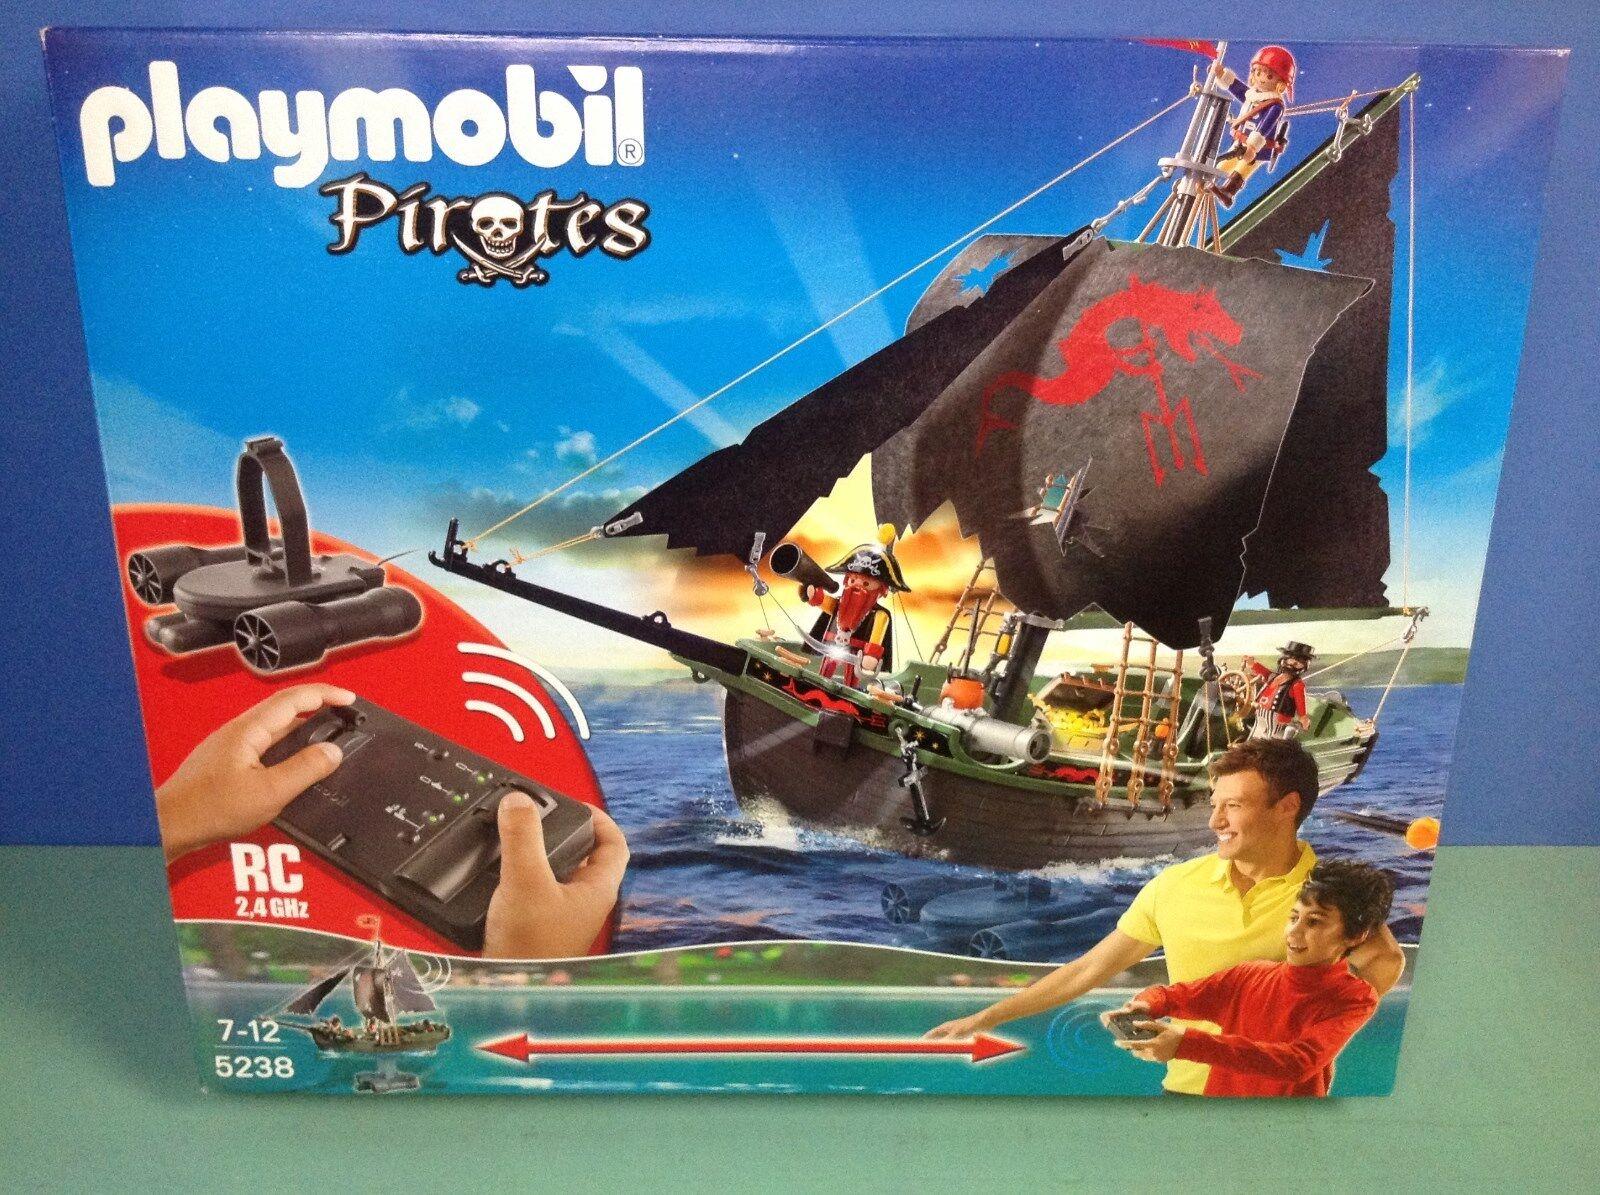 (N5238) Playmobil Gree Barco Piratas + uomodo Control  Remoto RC Ref 5238 -  più sconto